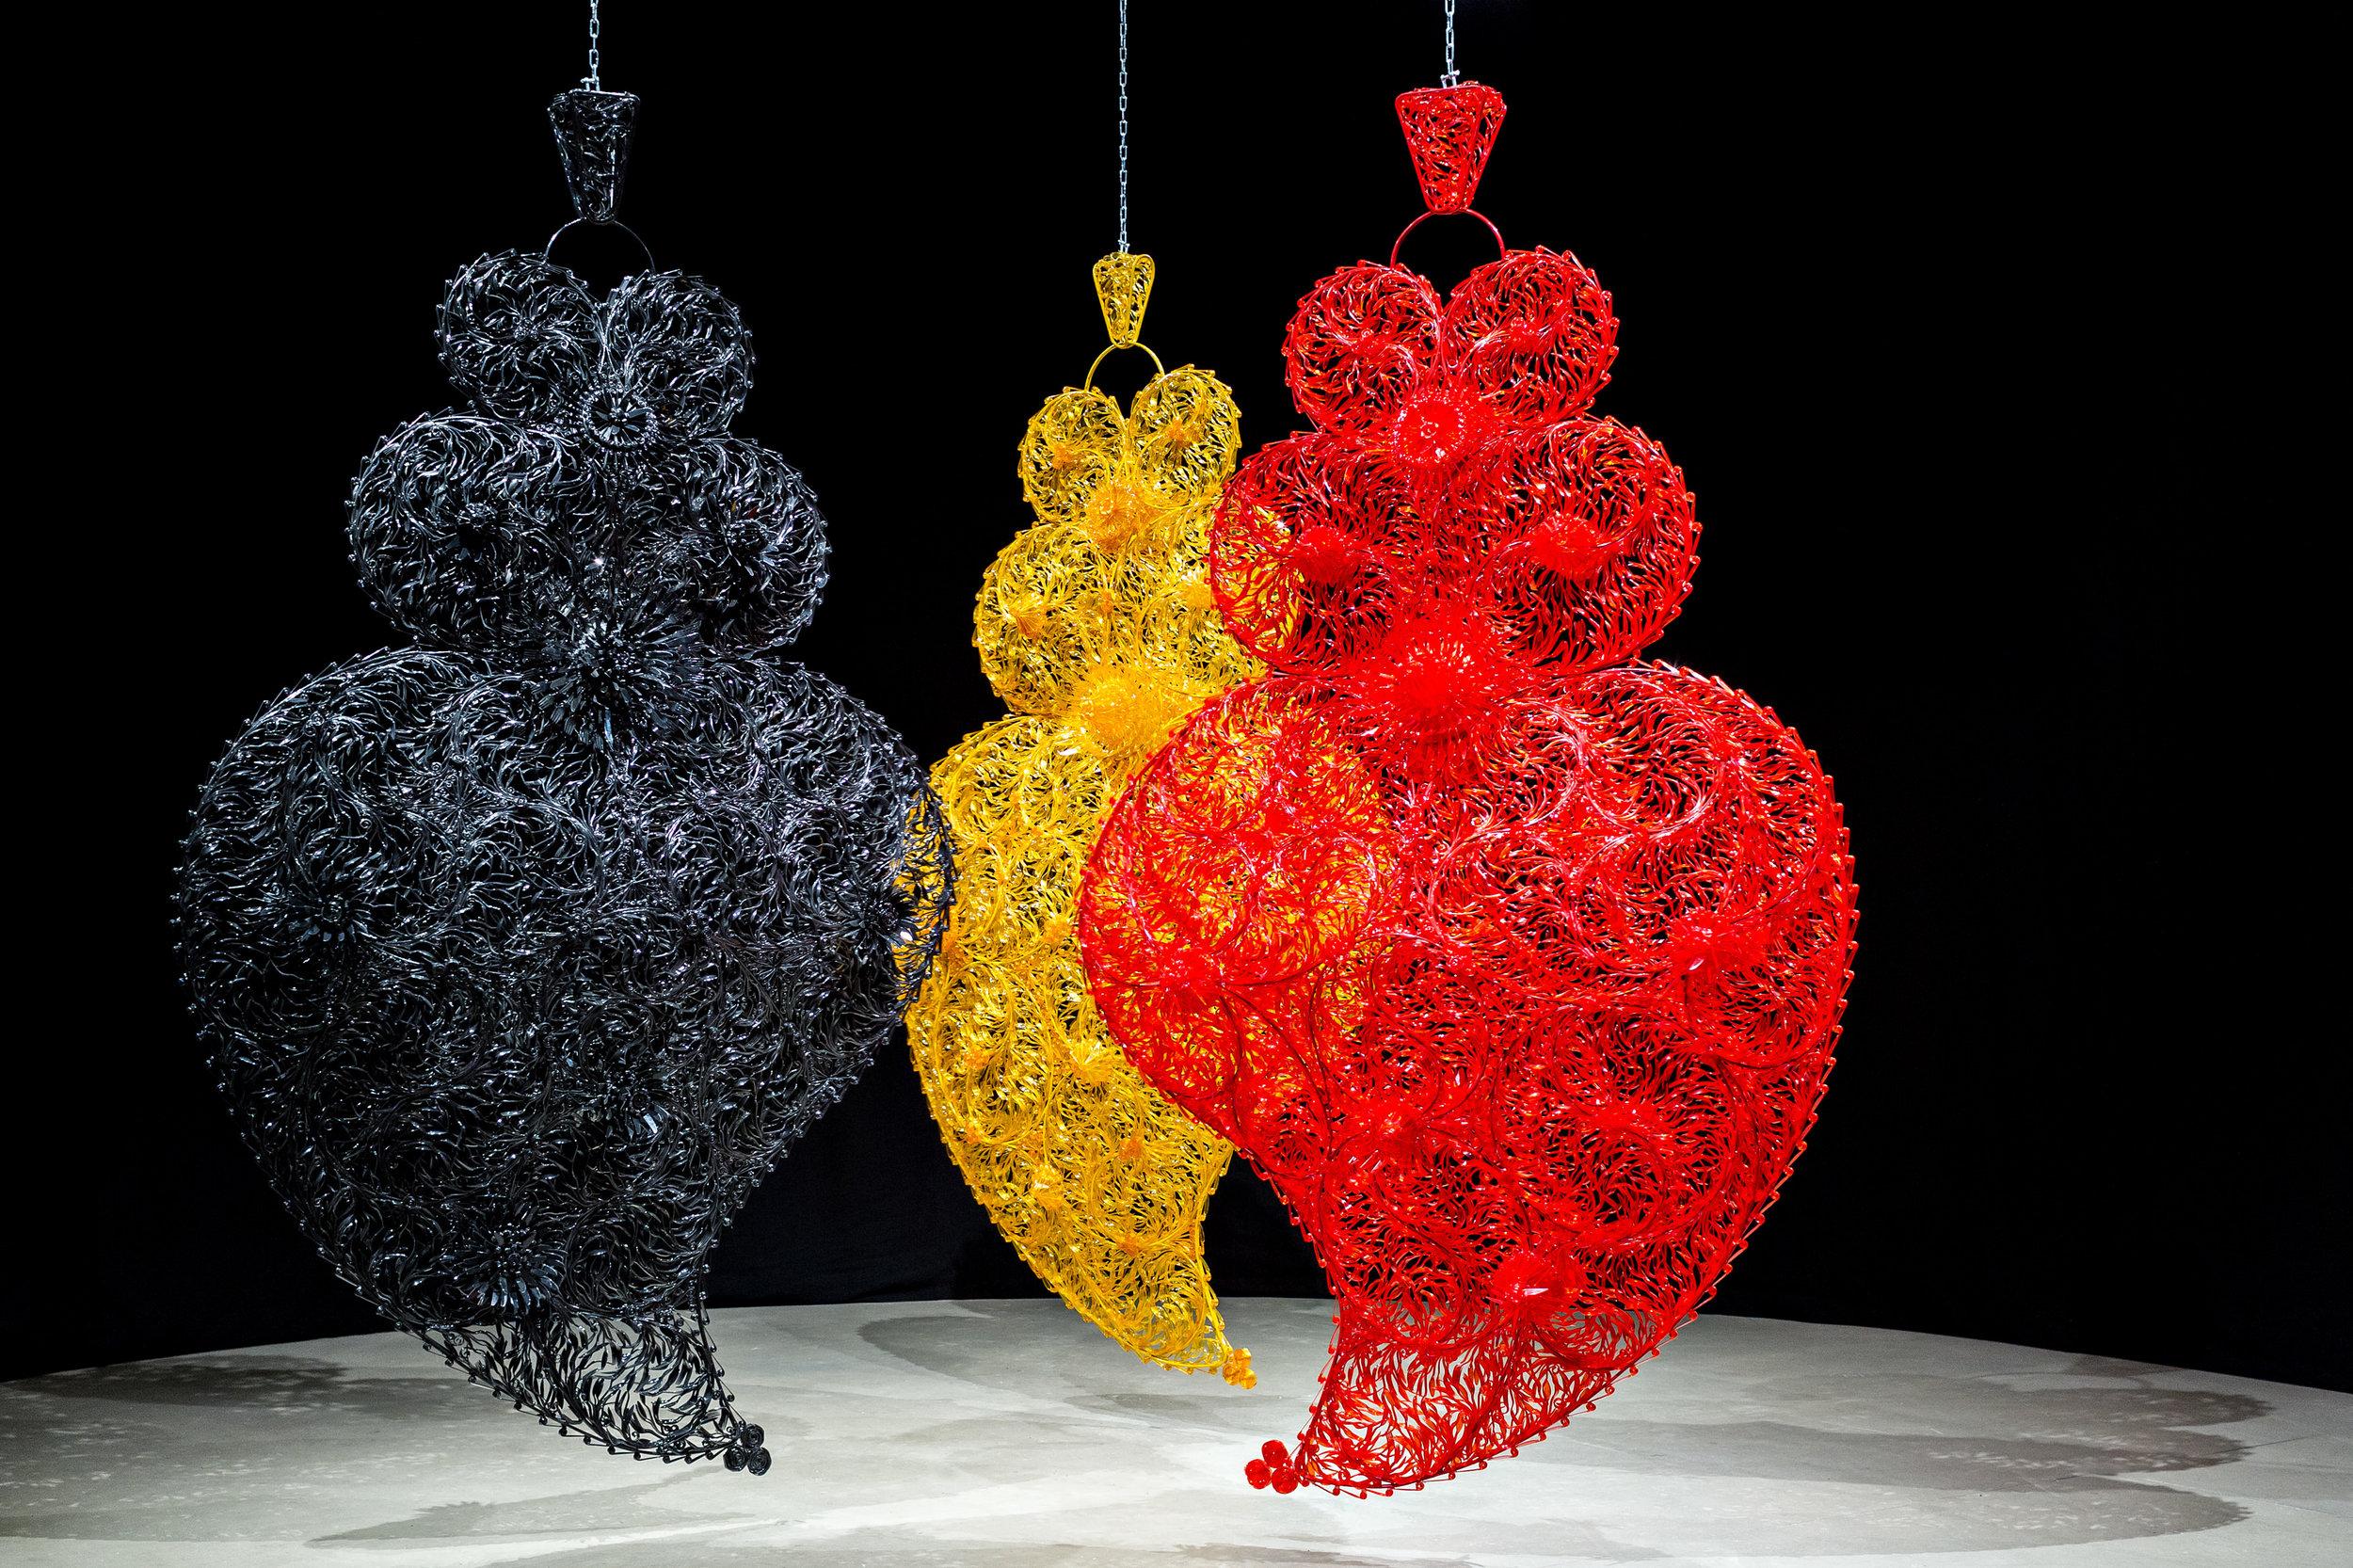 "Joana Vasconcelos, ""Black Independent Heart Golden Independent Heart Red Independent Heart"", 2004-06; Foto: Luís Vasconcelos; Courtesy Unidade Infinita Projectos"